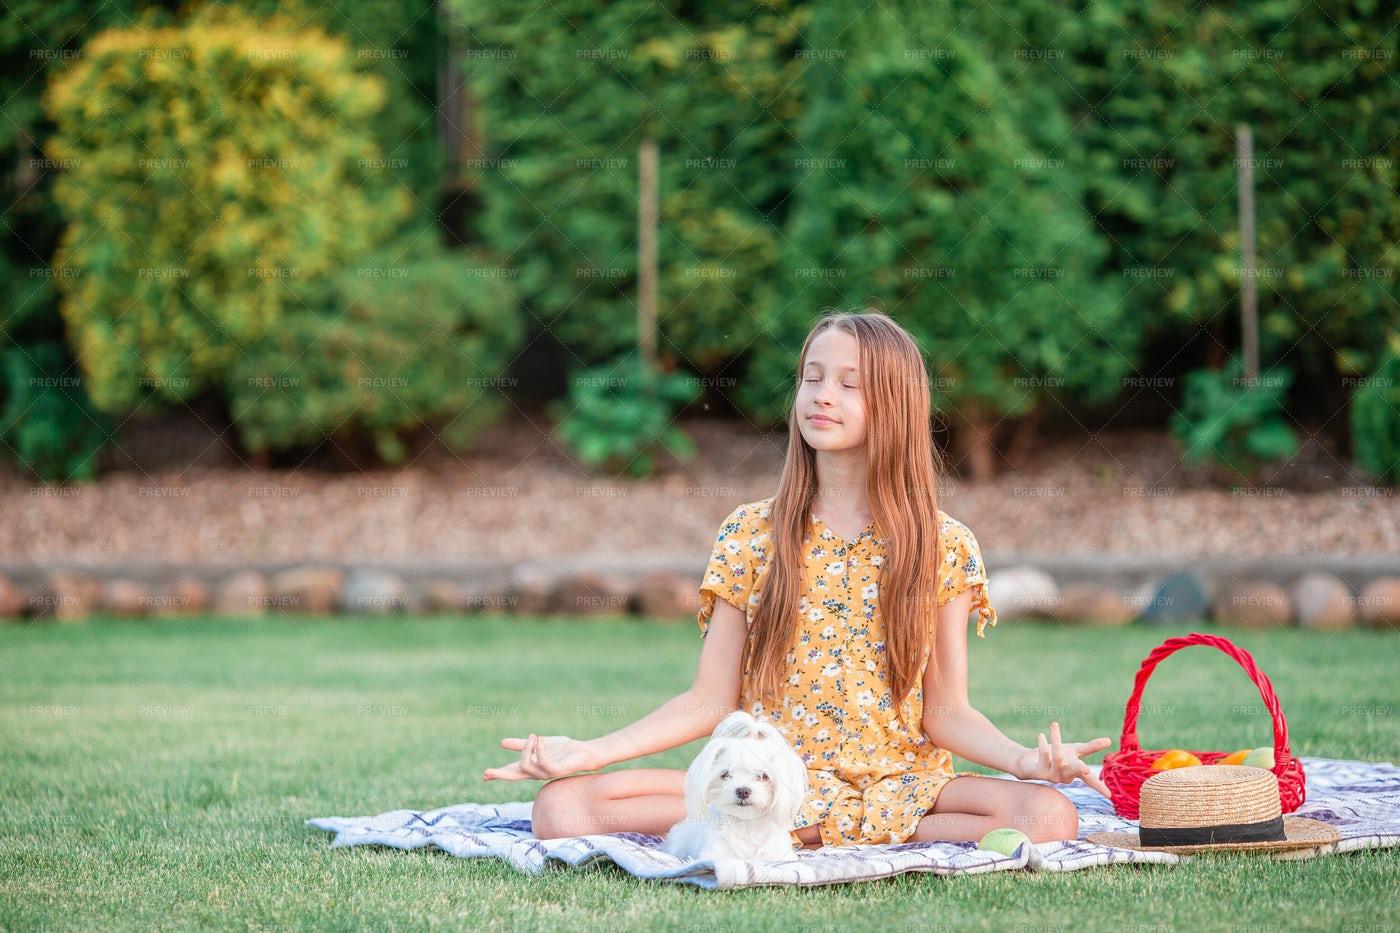 Girl In Yoga Position: Stock Photos